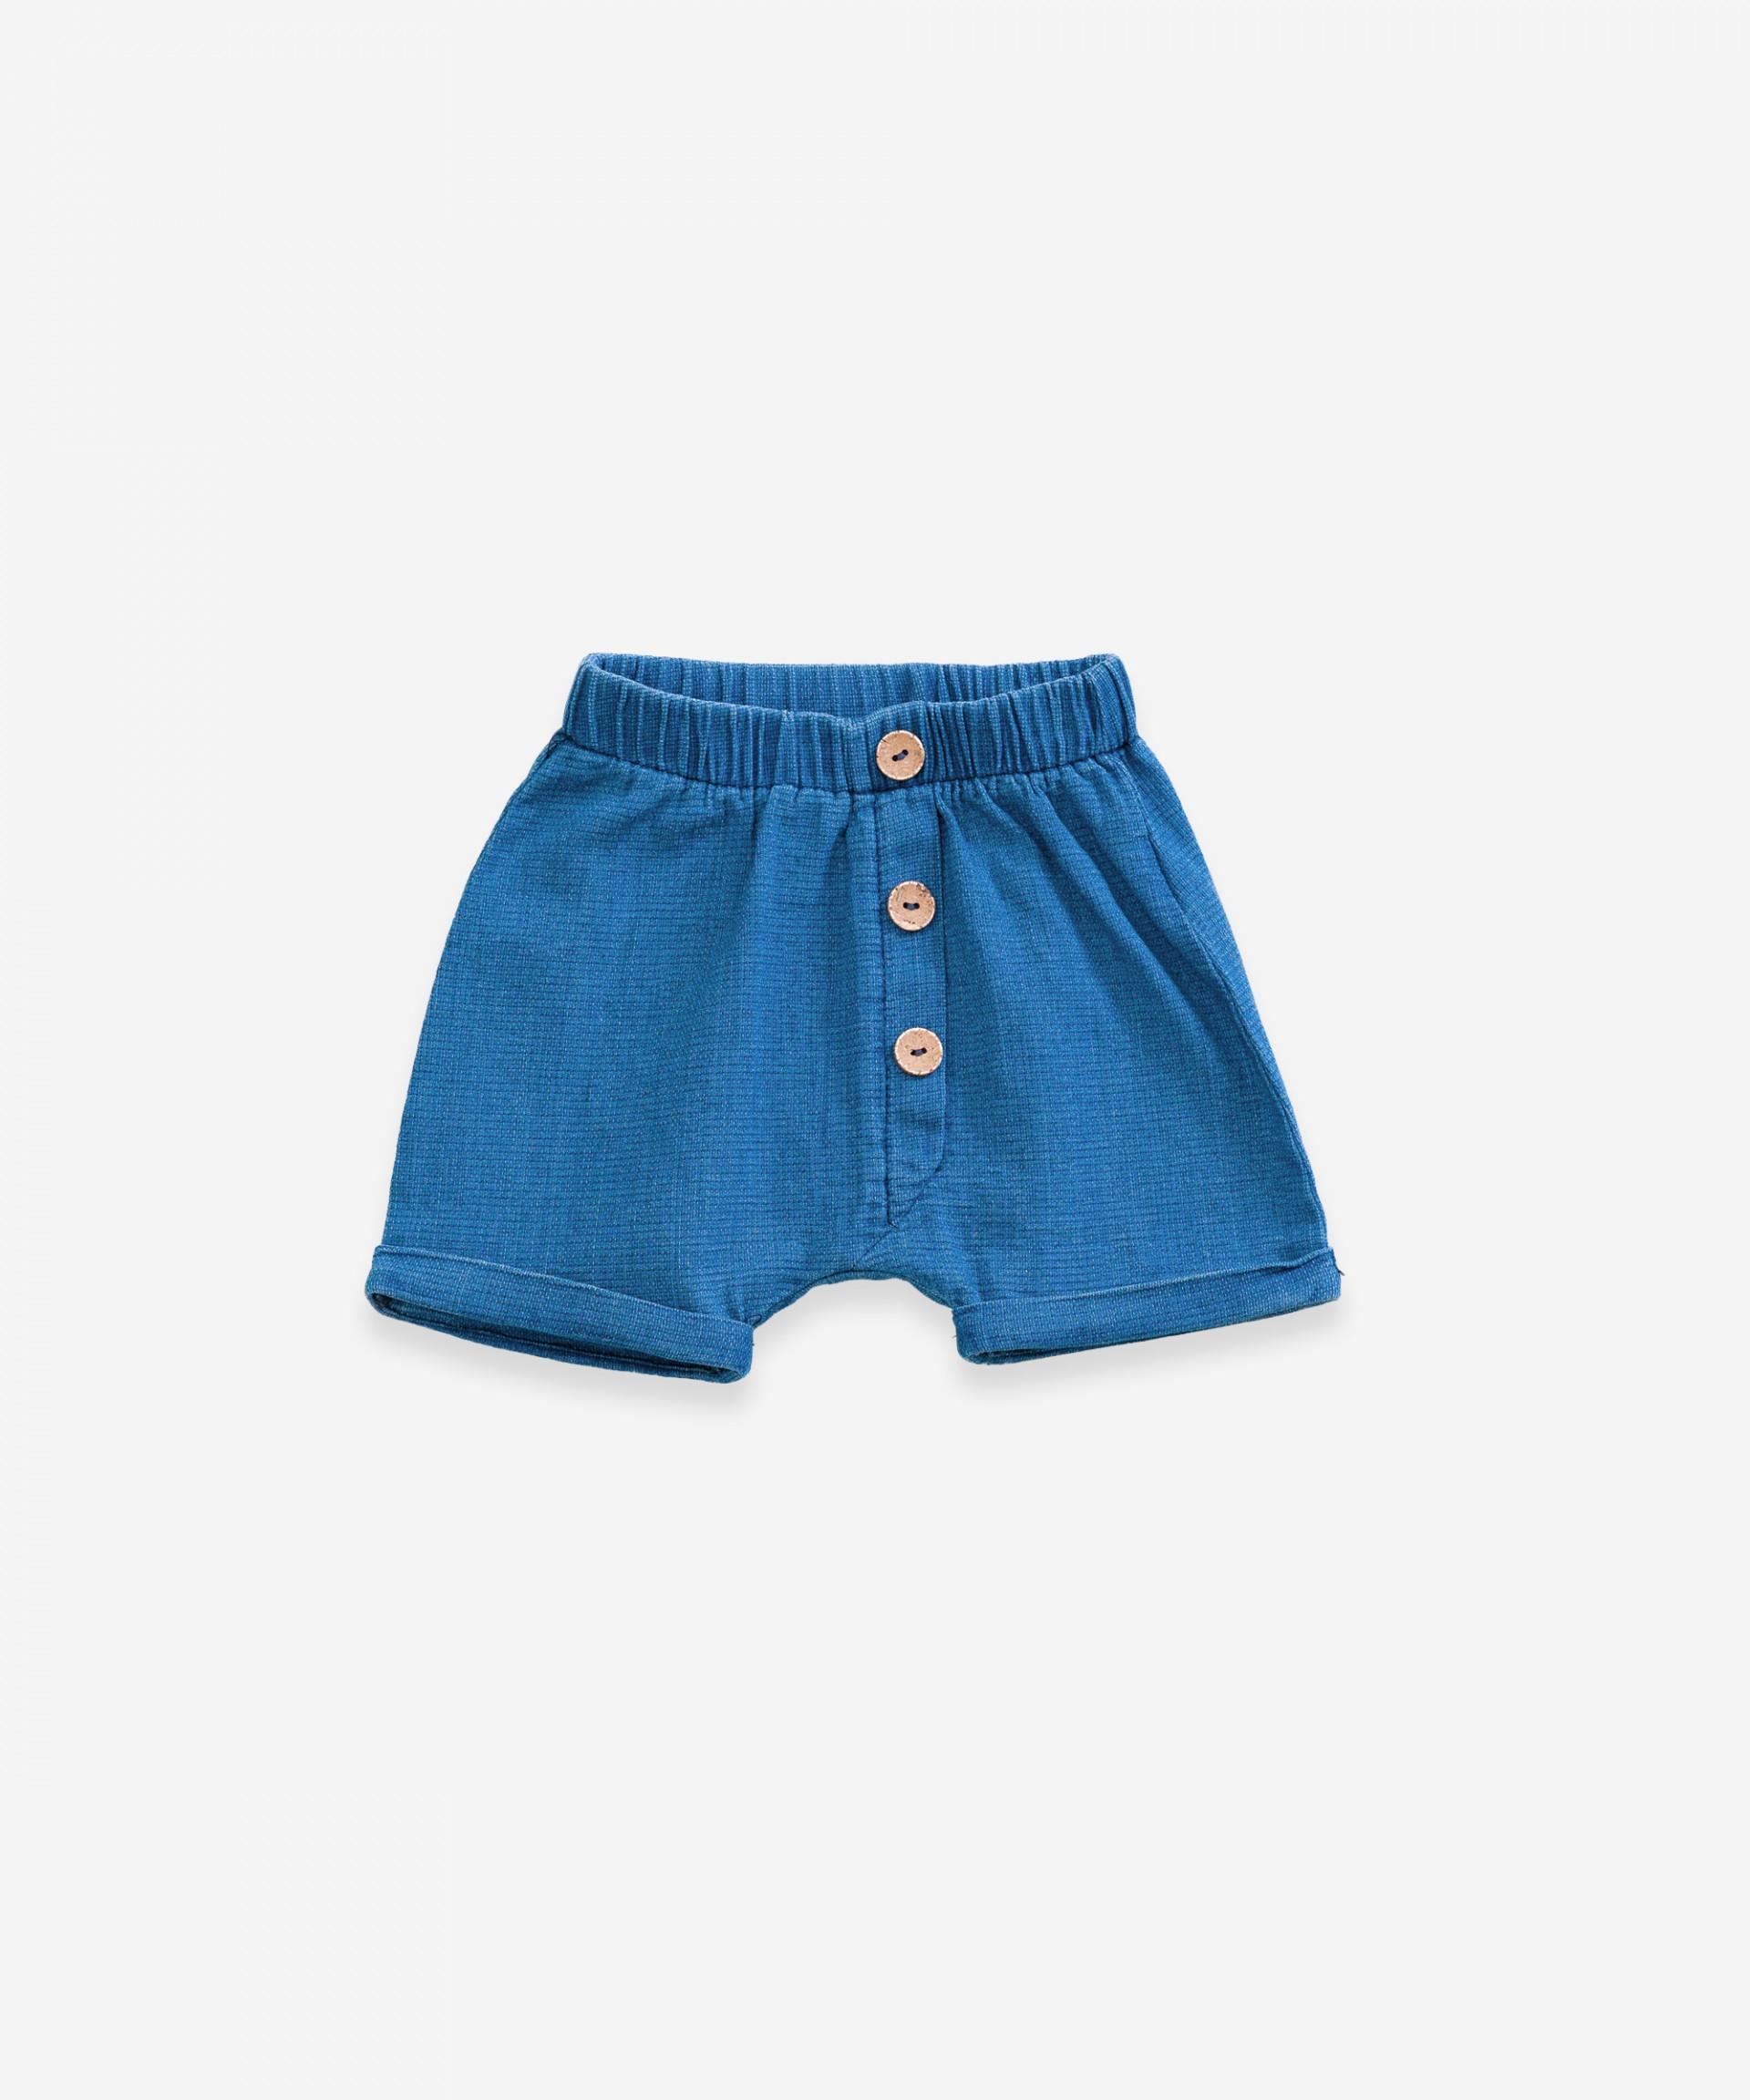 Pantalón corto vaquero con botones| Weaving